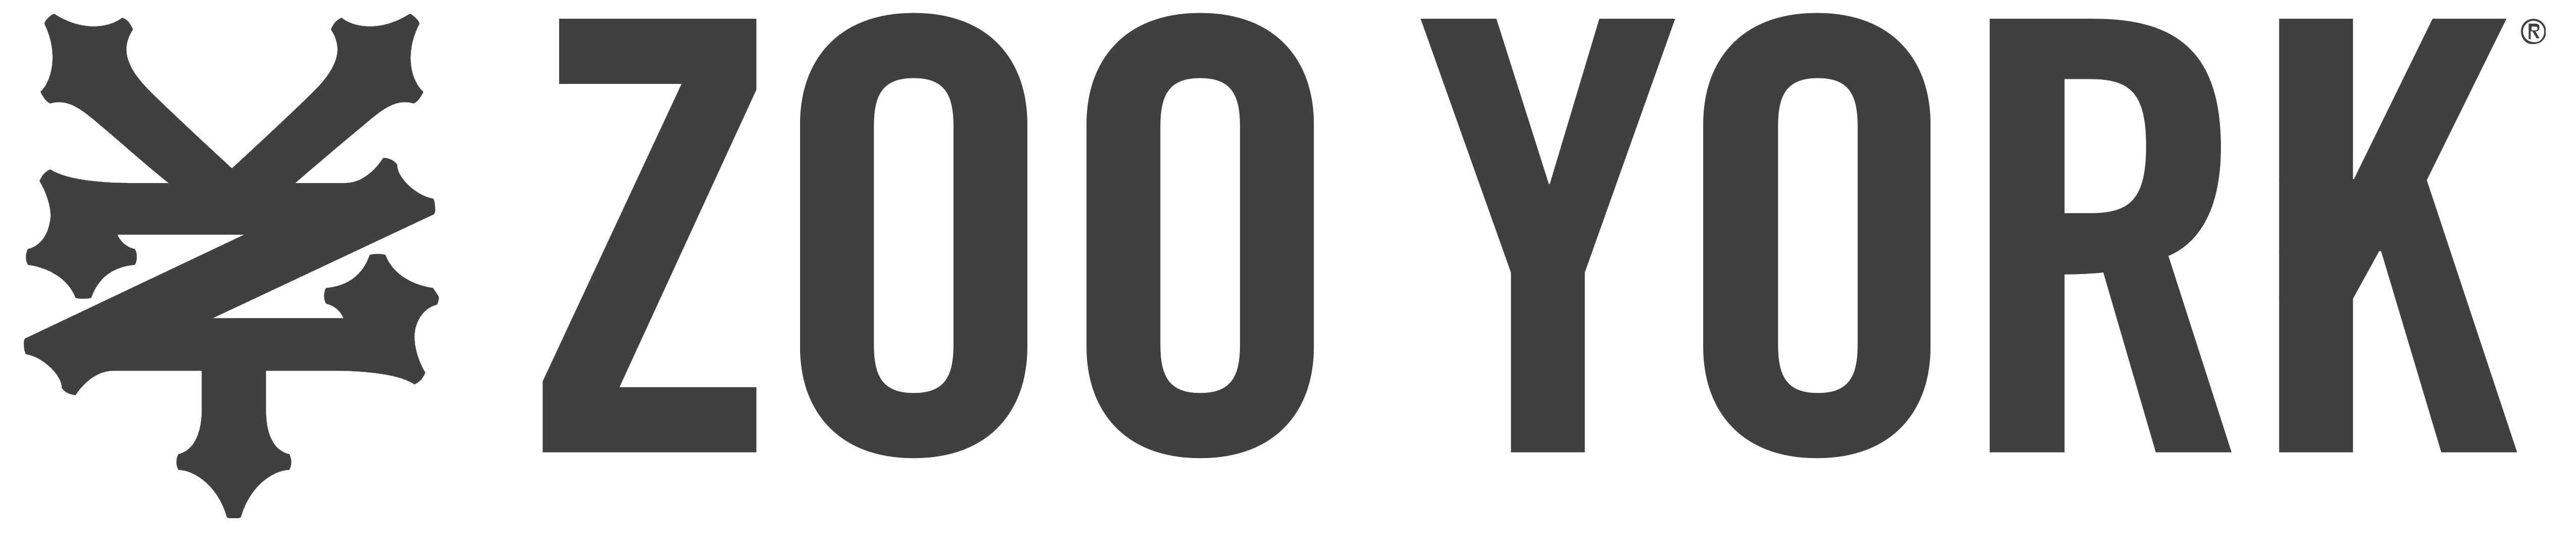 Zoo york skateboards logo